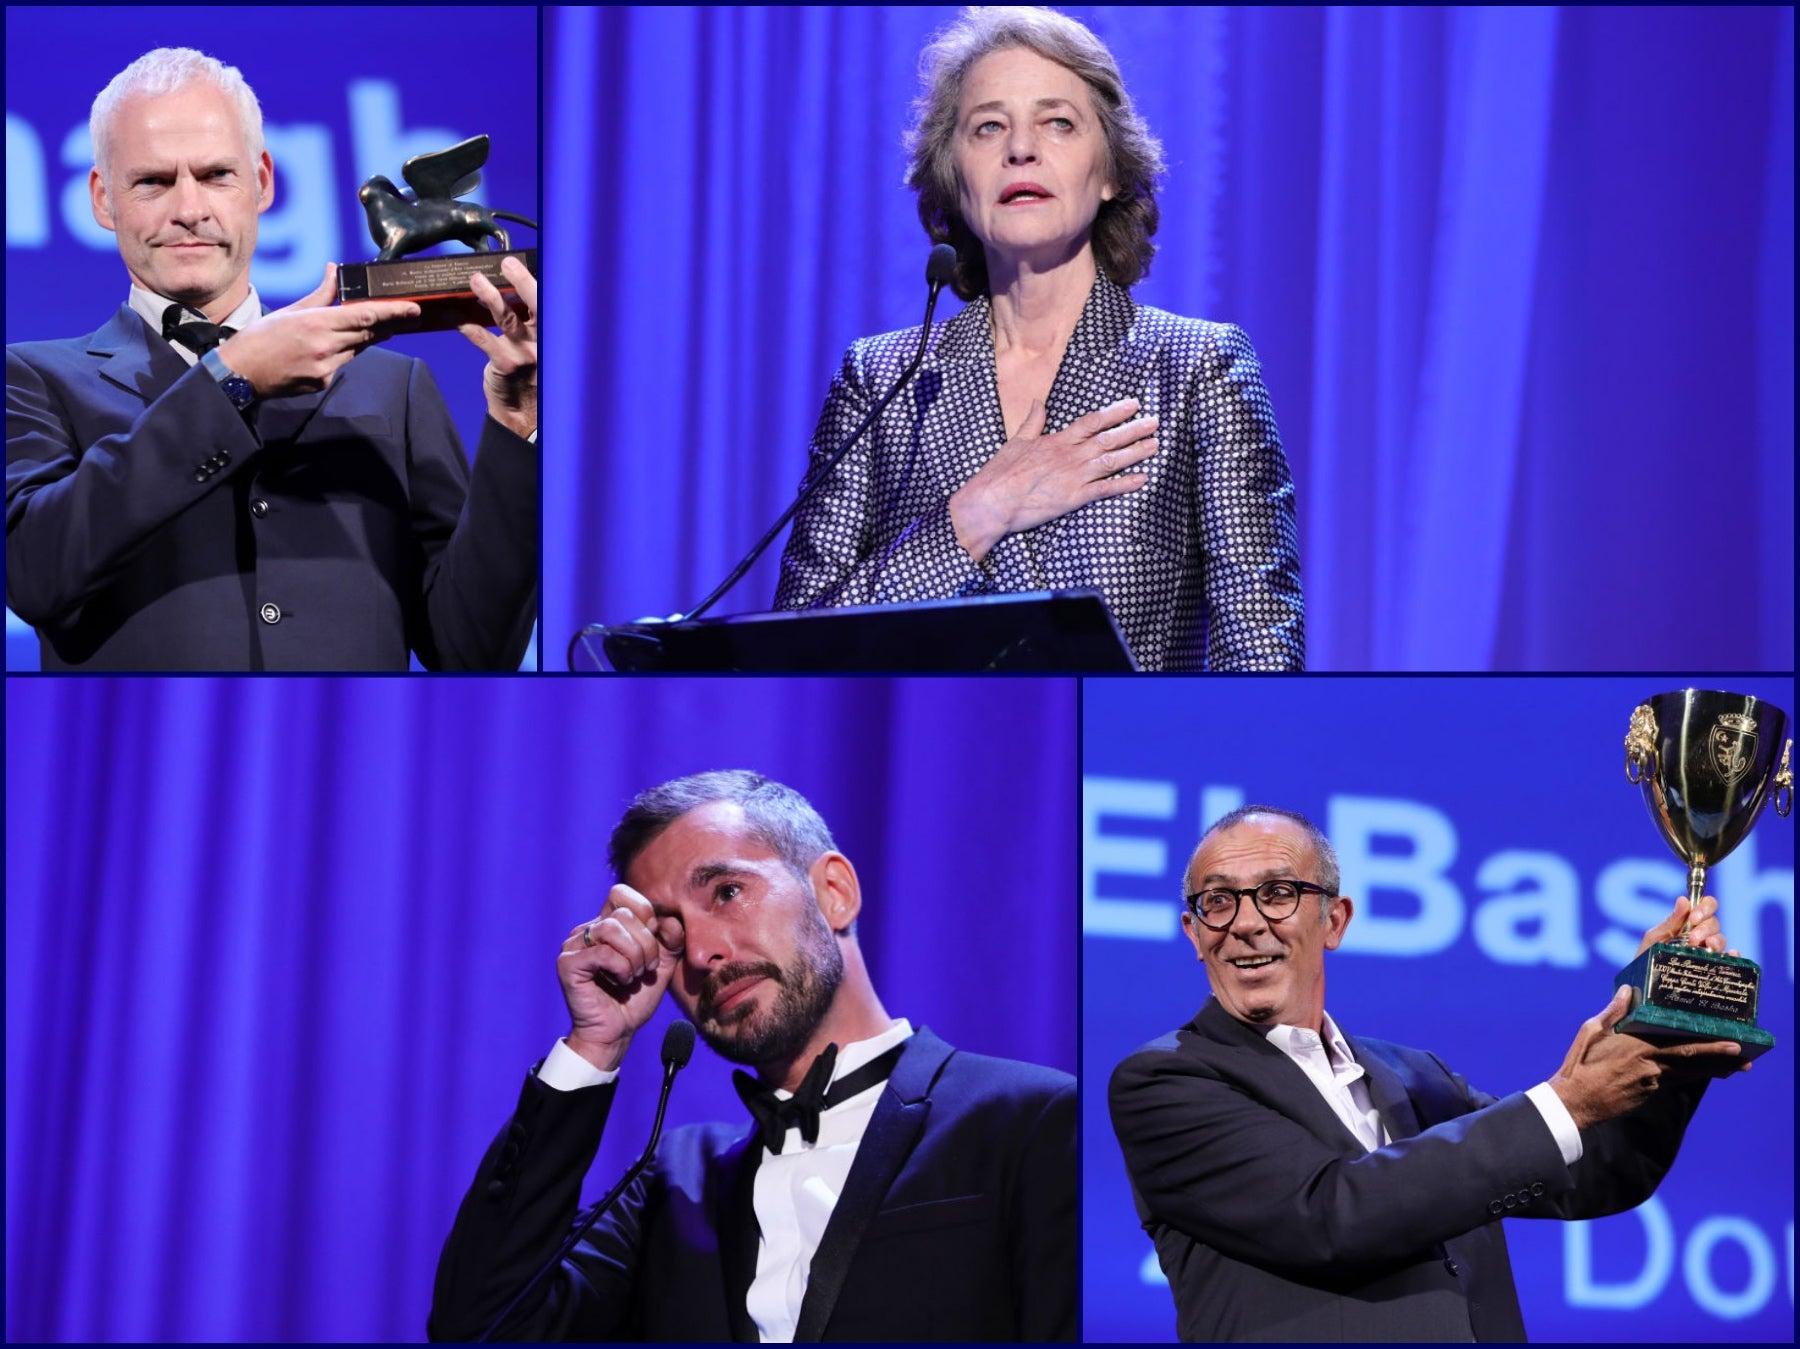 Winners of the 2017 Venice Film Festival